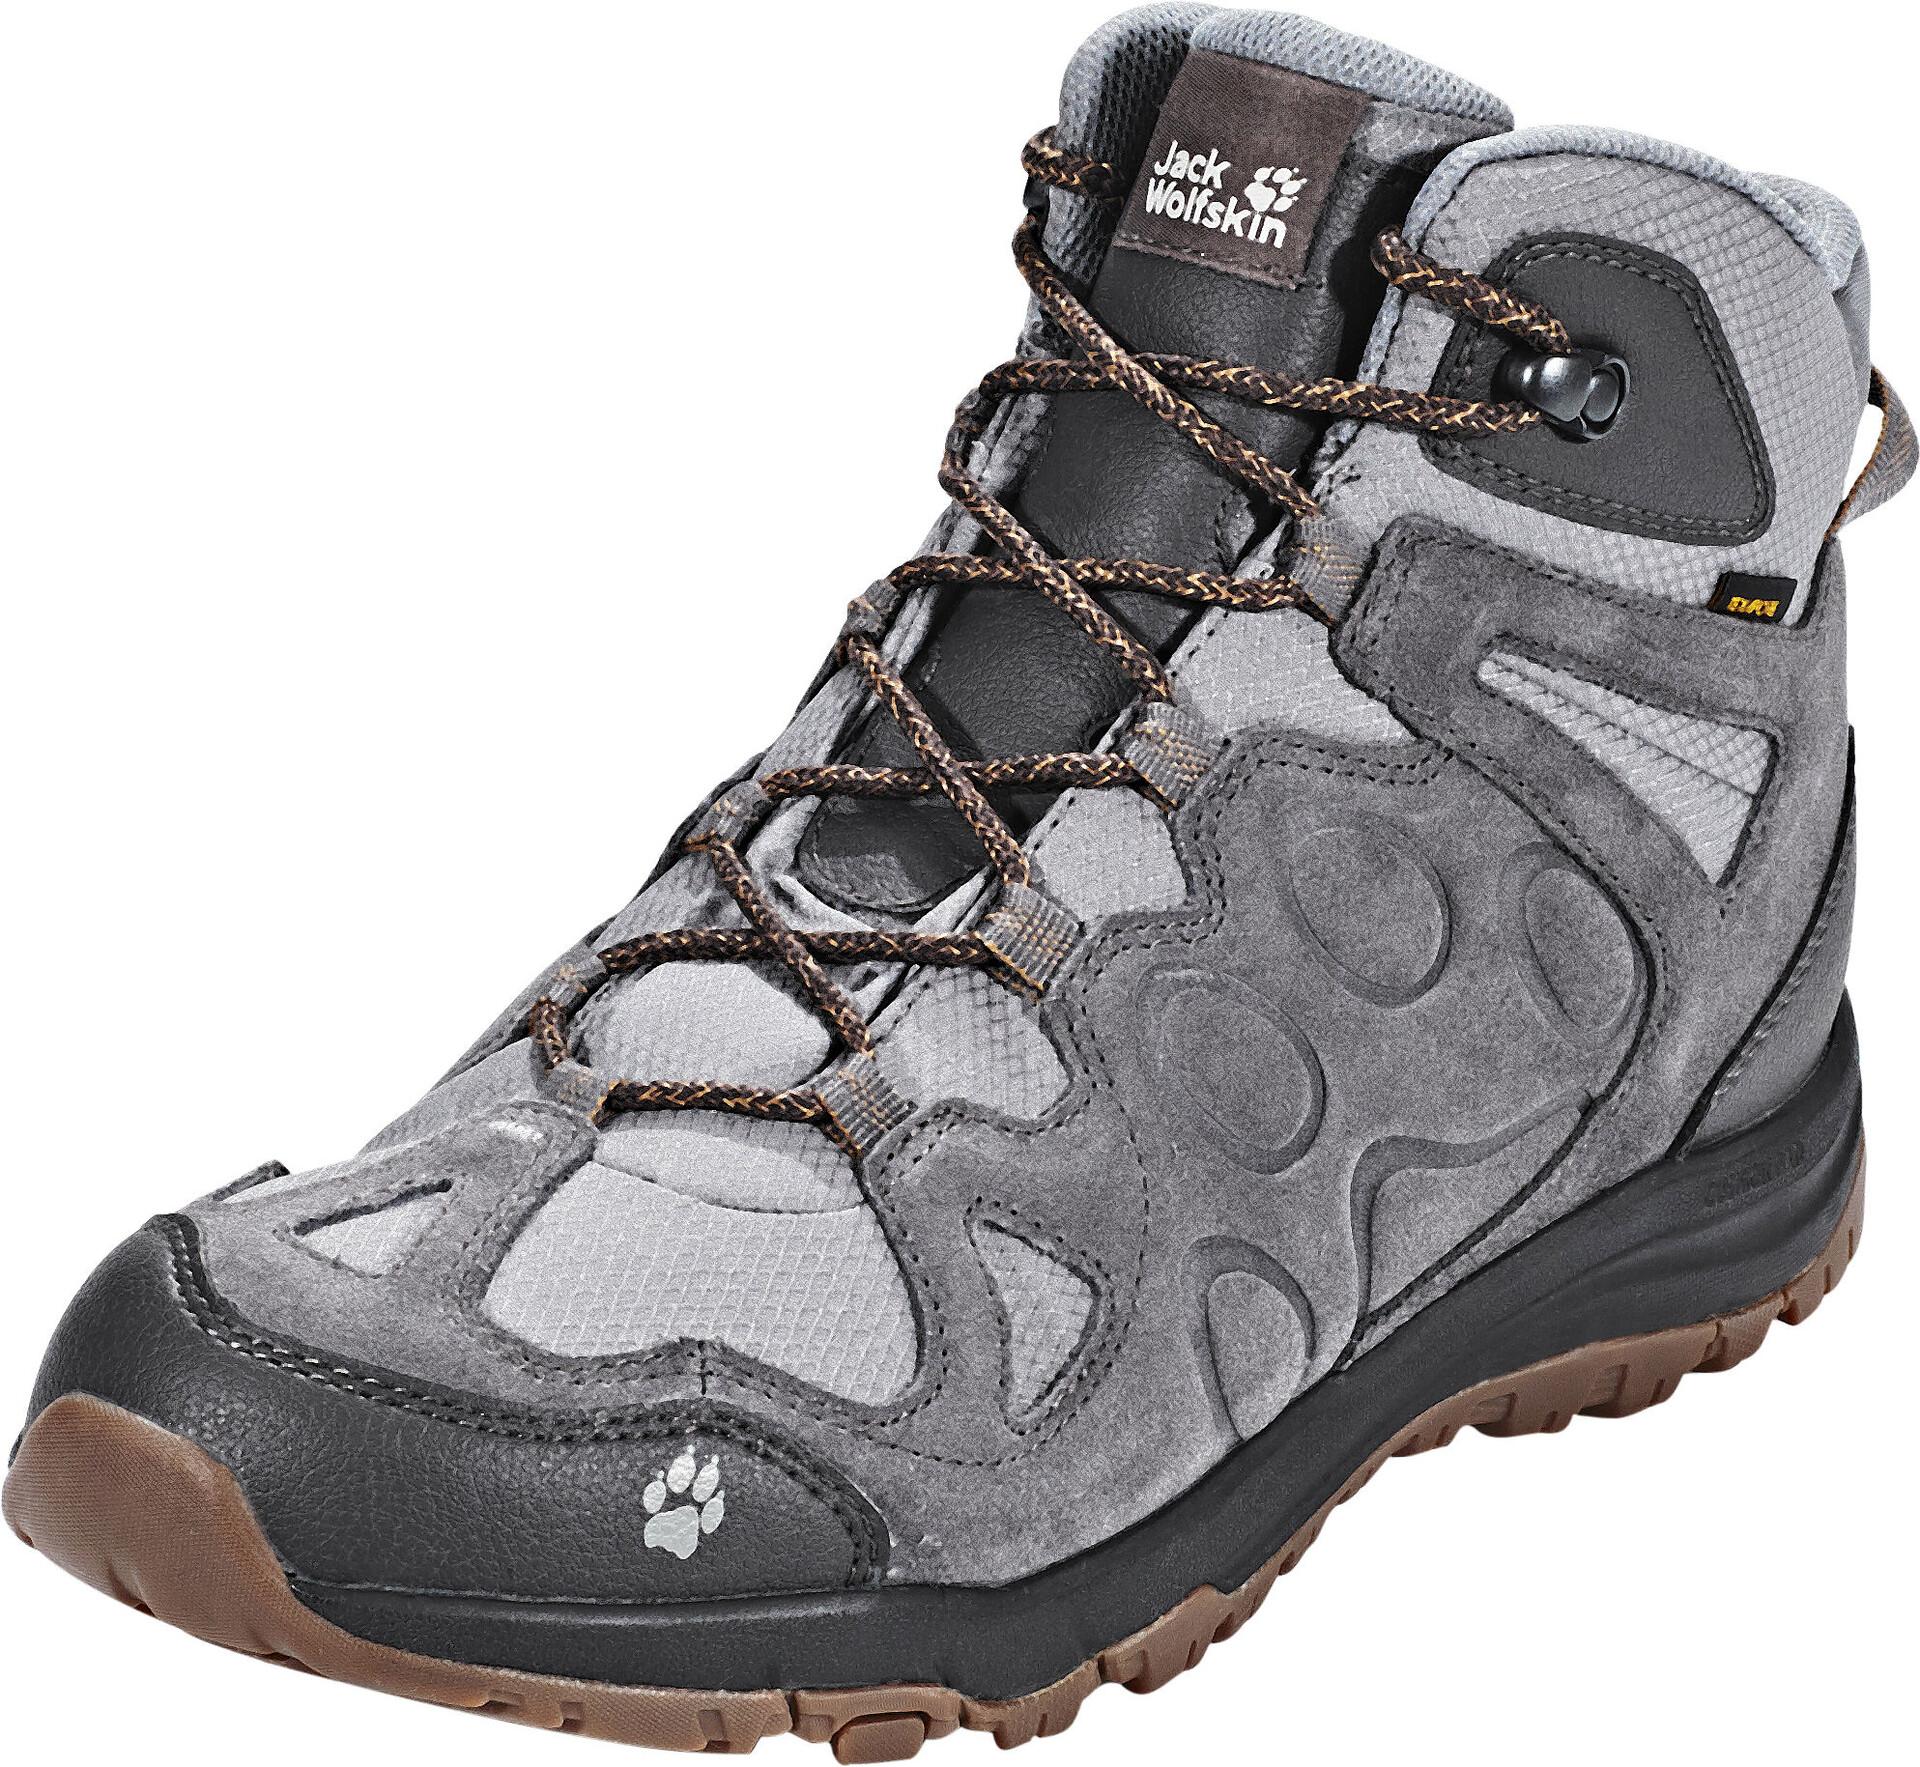 Chaussures Sur Texapore Wolfskin Rocksand Gris Homme Jack qRwgFtHtOx